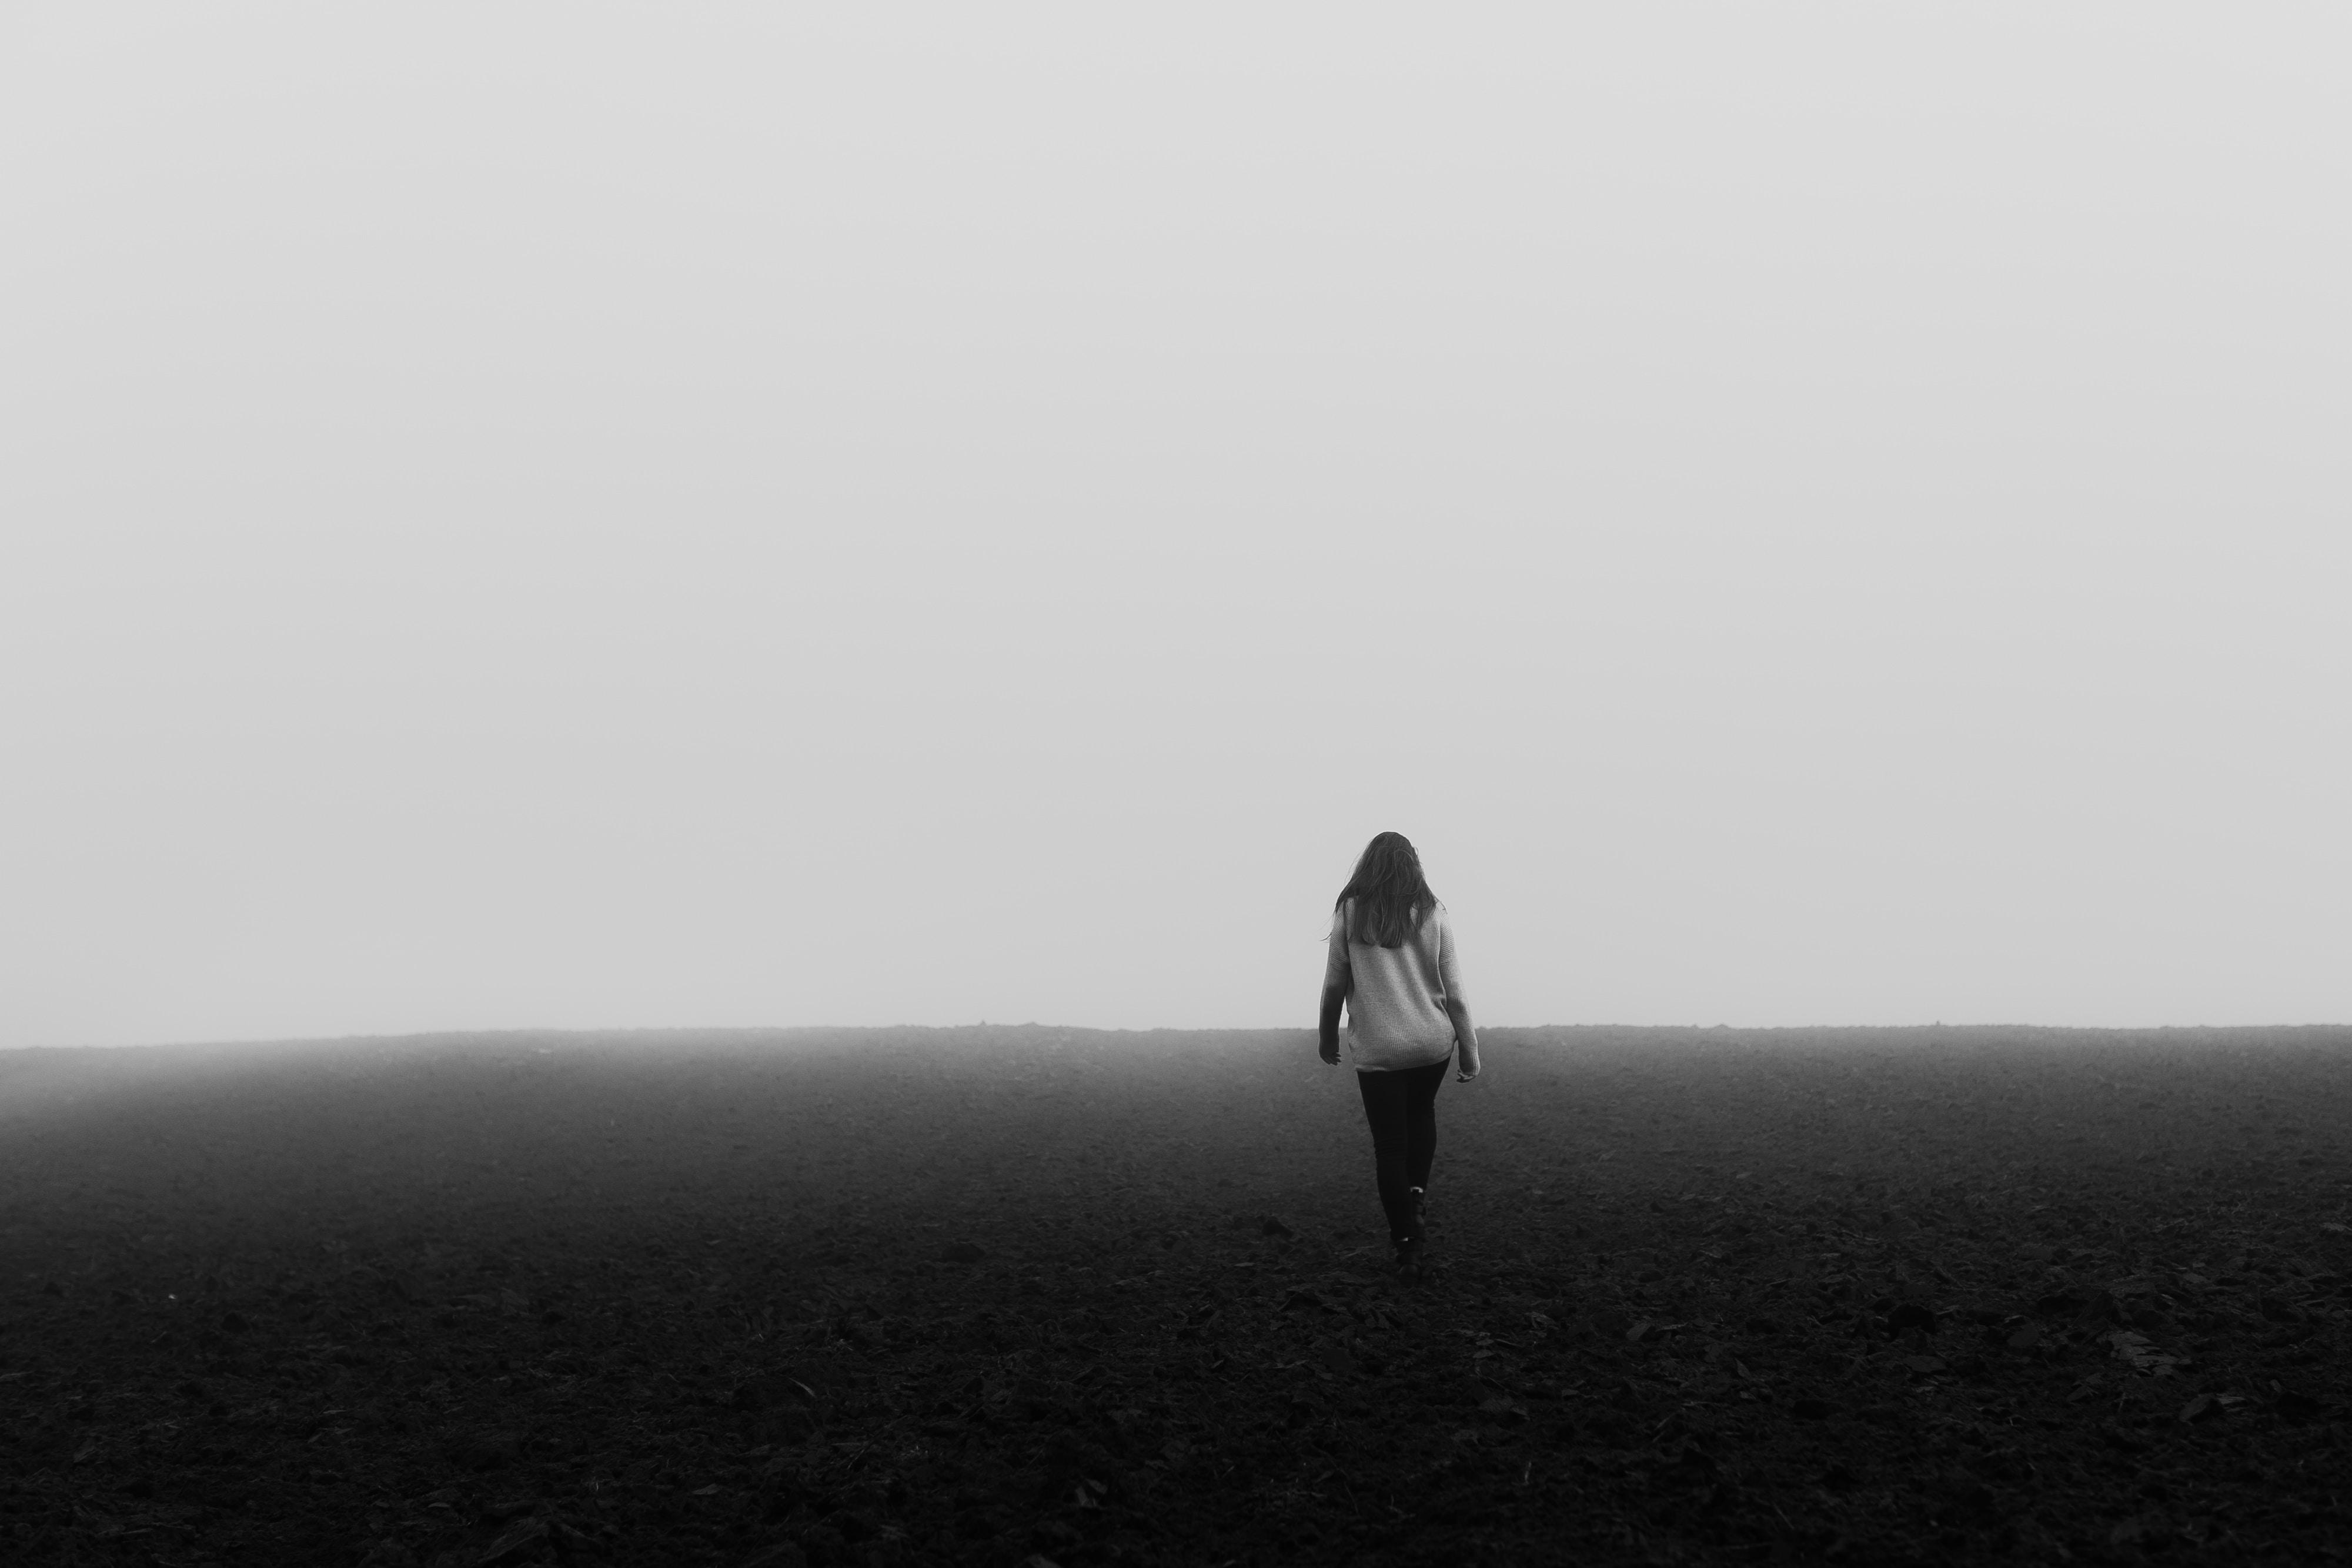 woman walking on black surface